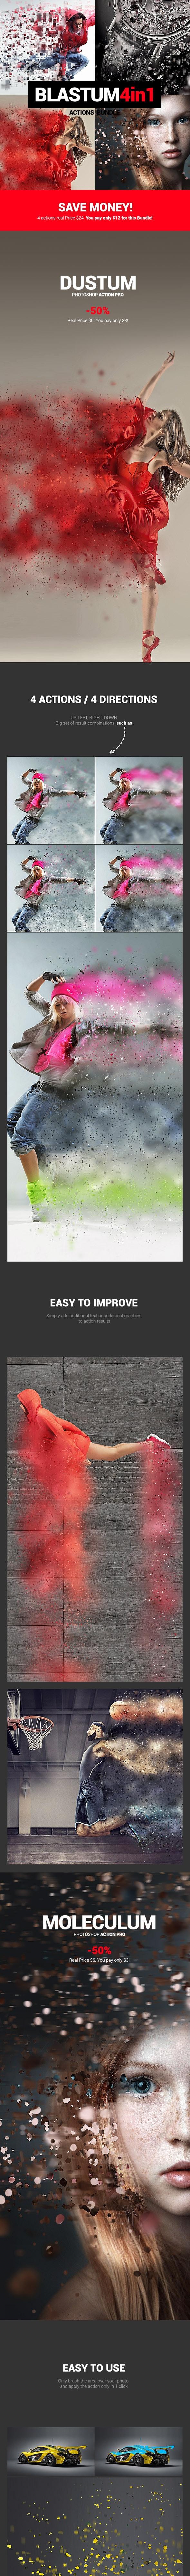 4in1 Bundle - Blastum - Photoshop Actions - Photo Effects Actions